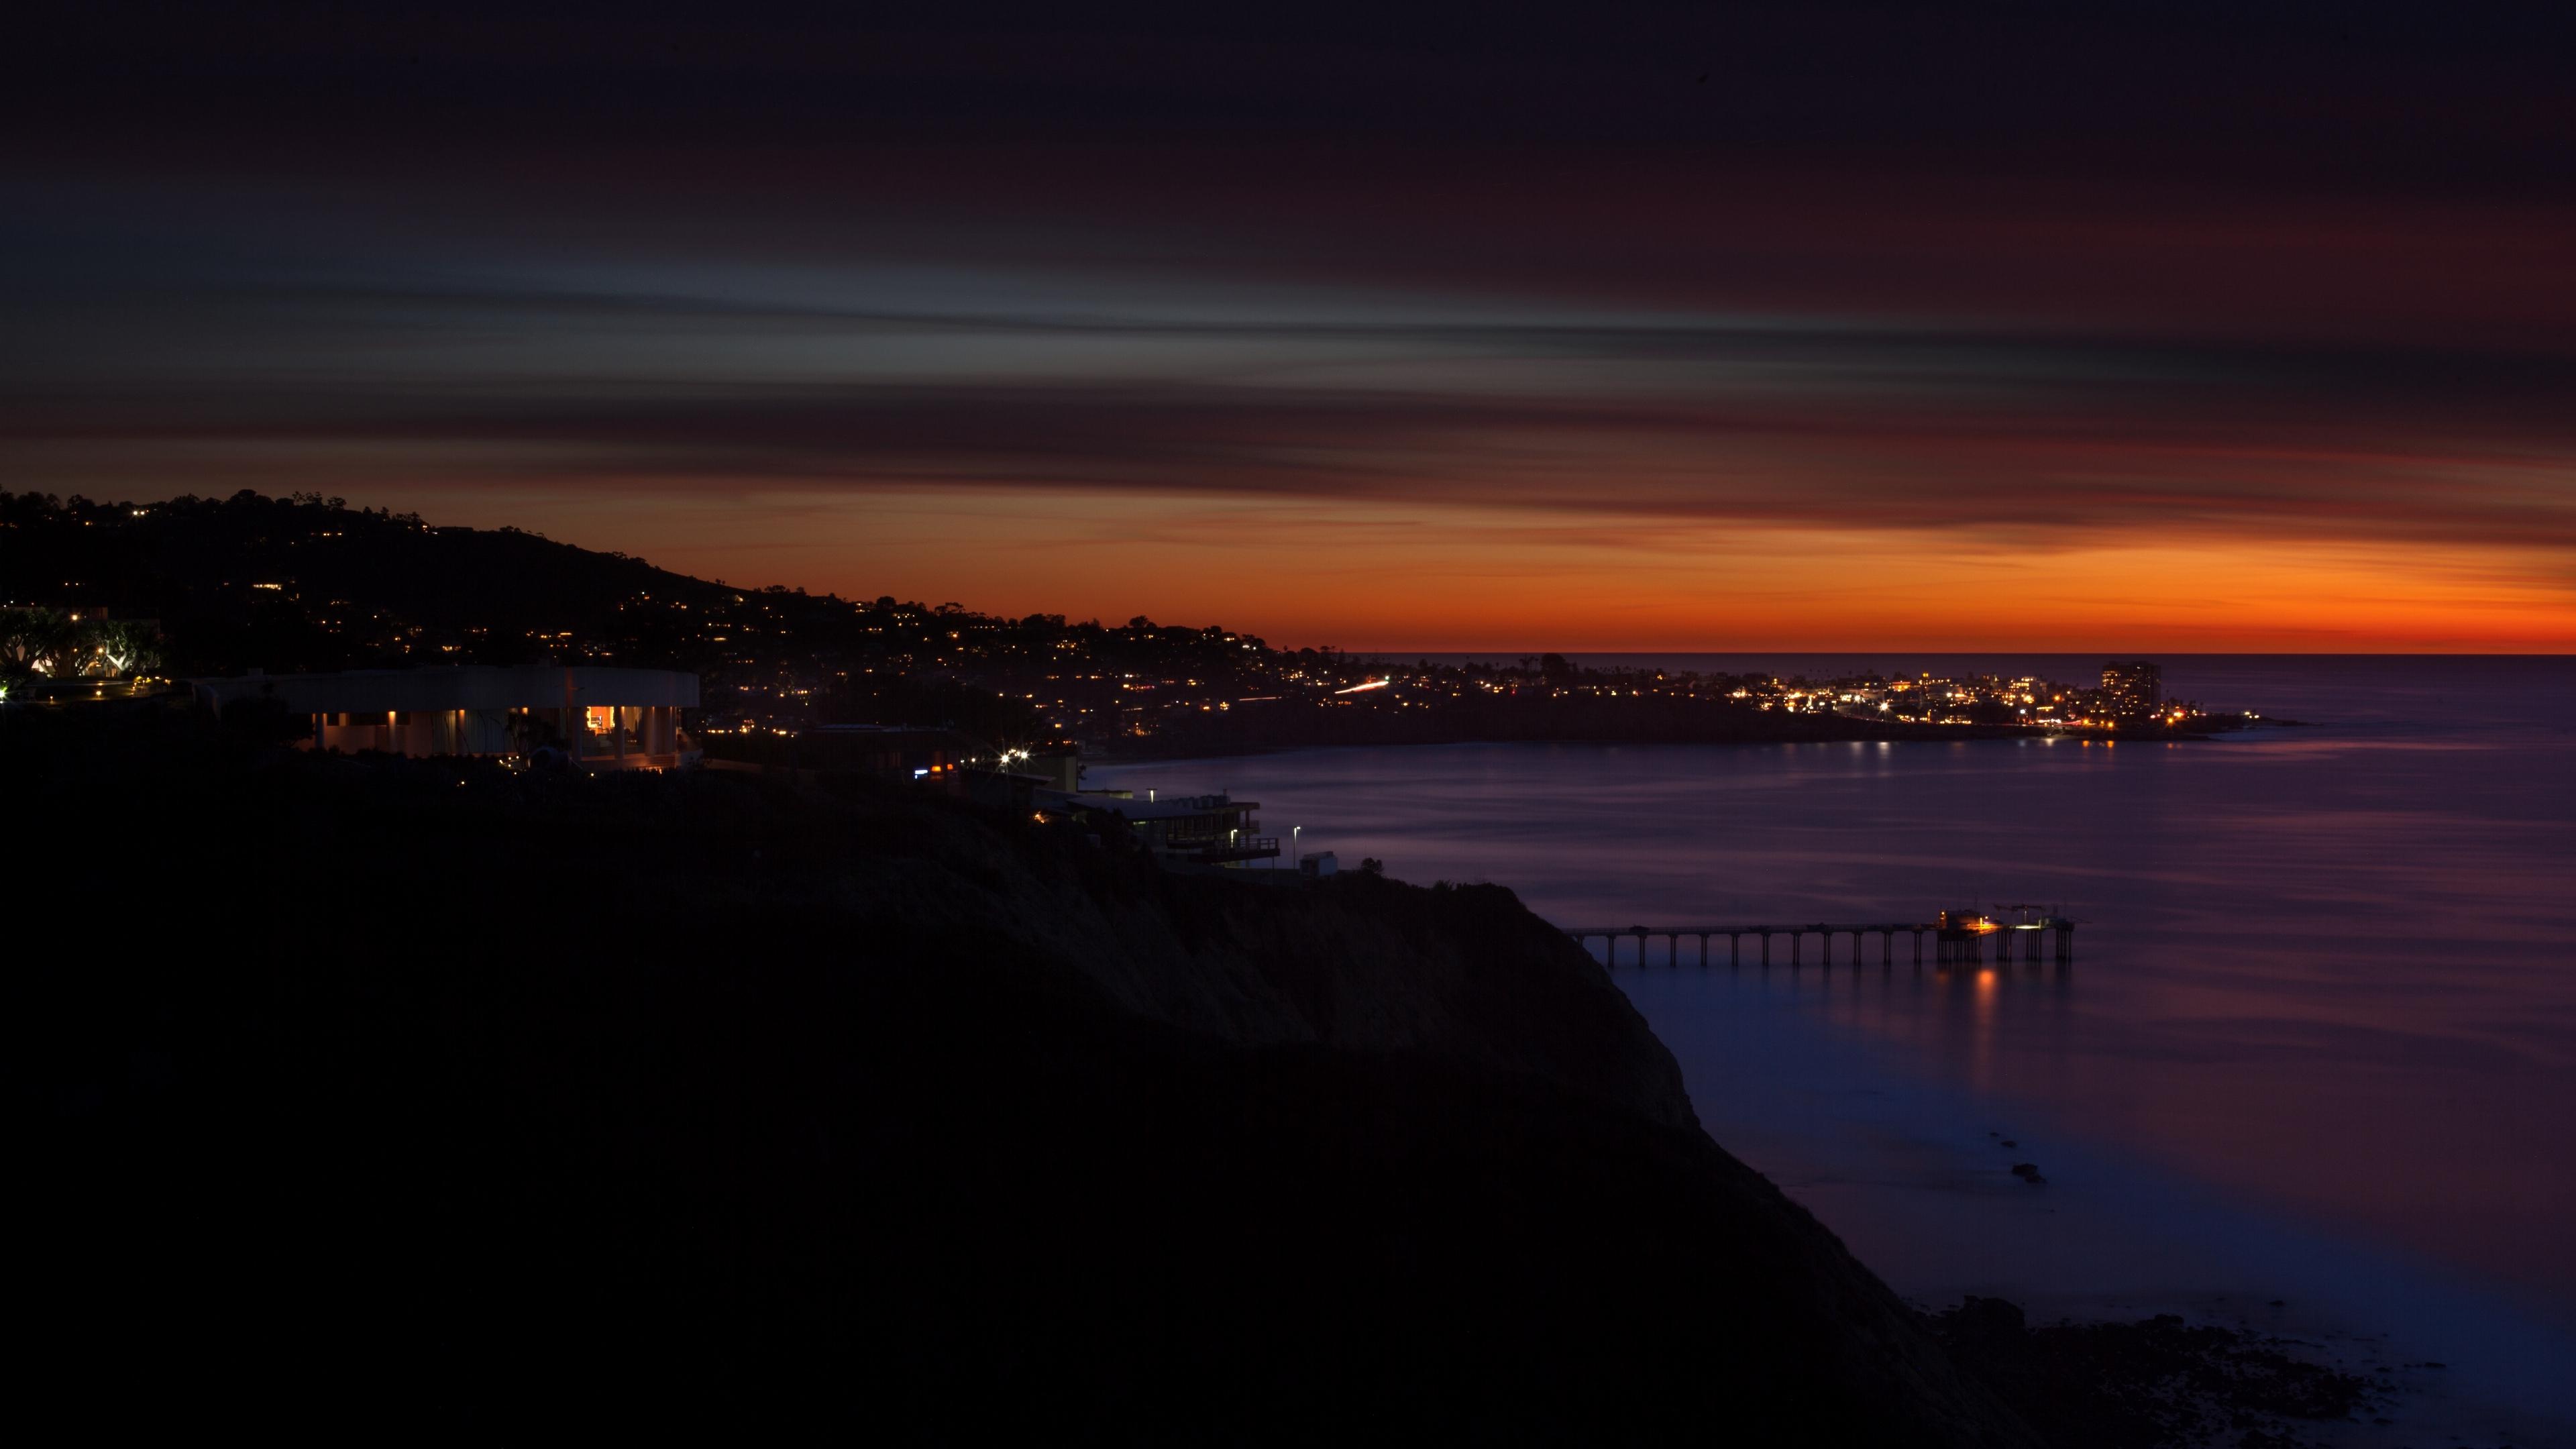 scripps usa beach night sunset 4k 1538066405 - scripps, usa, beach, night, sunset 4k - USA, scripps, Beach